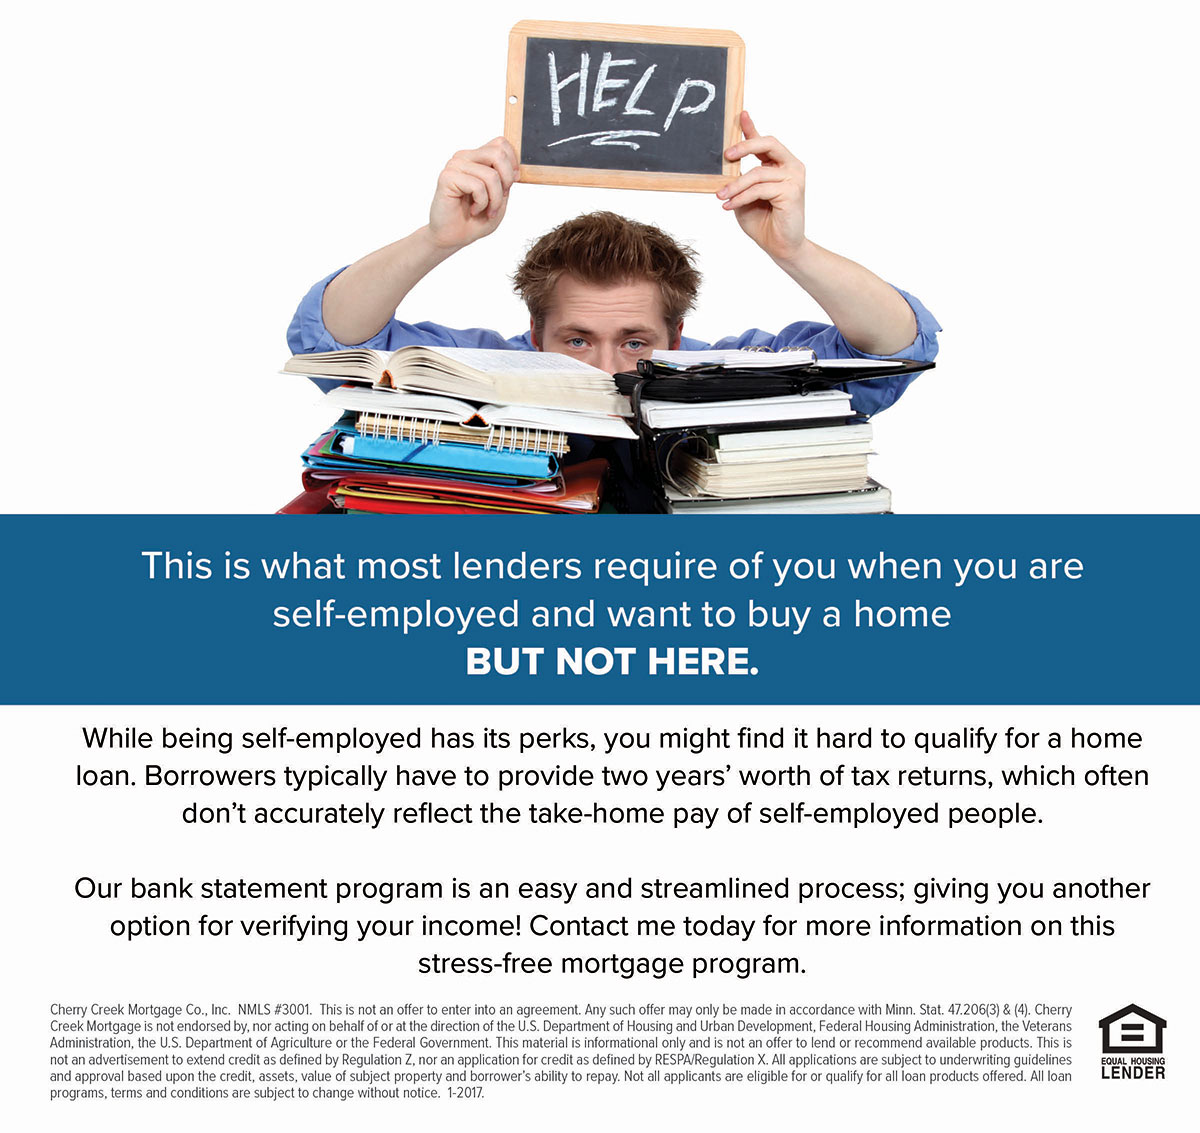 Mortgage Process - Self-Employed Bank Statement Program.jpg